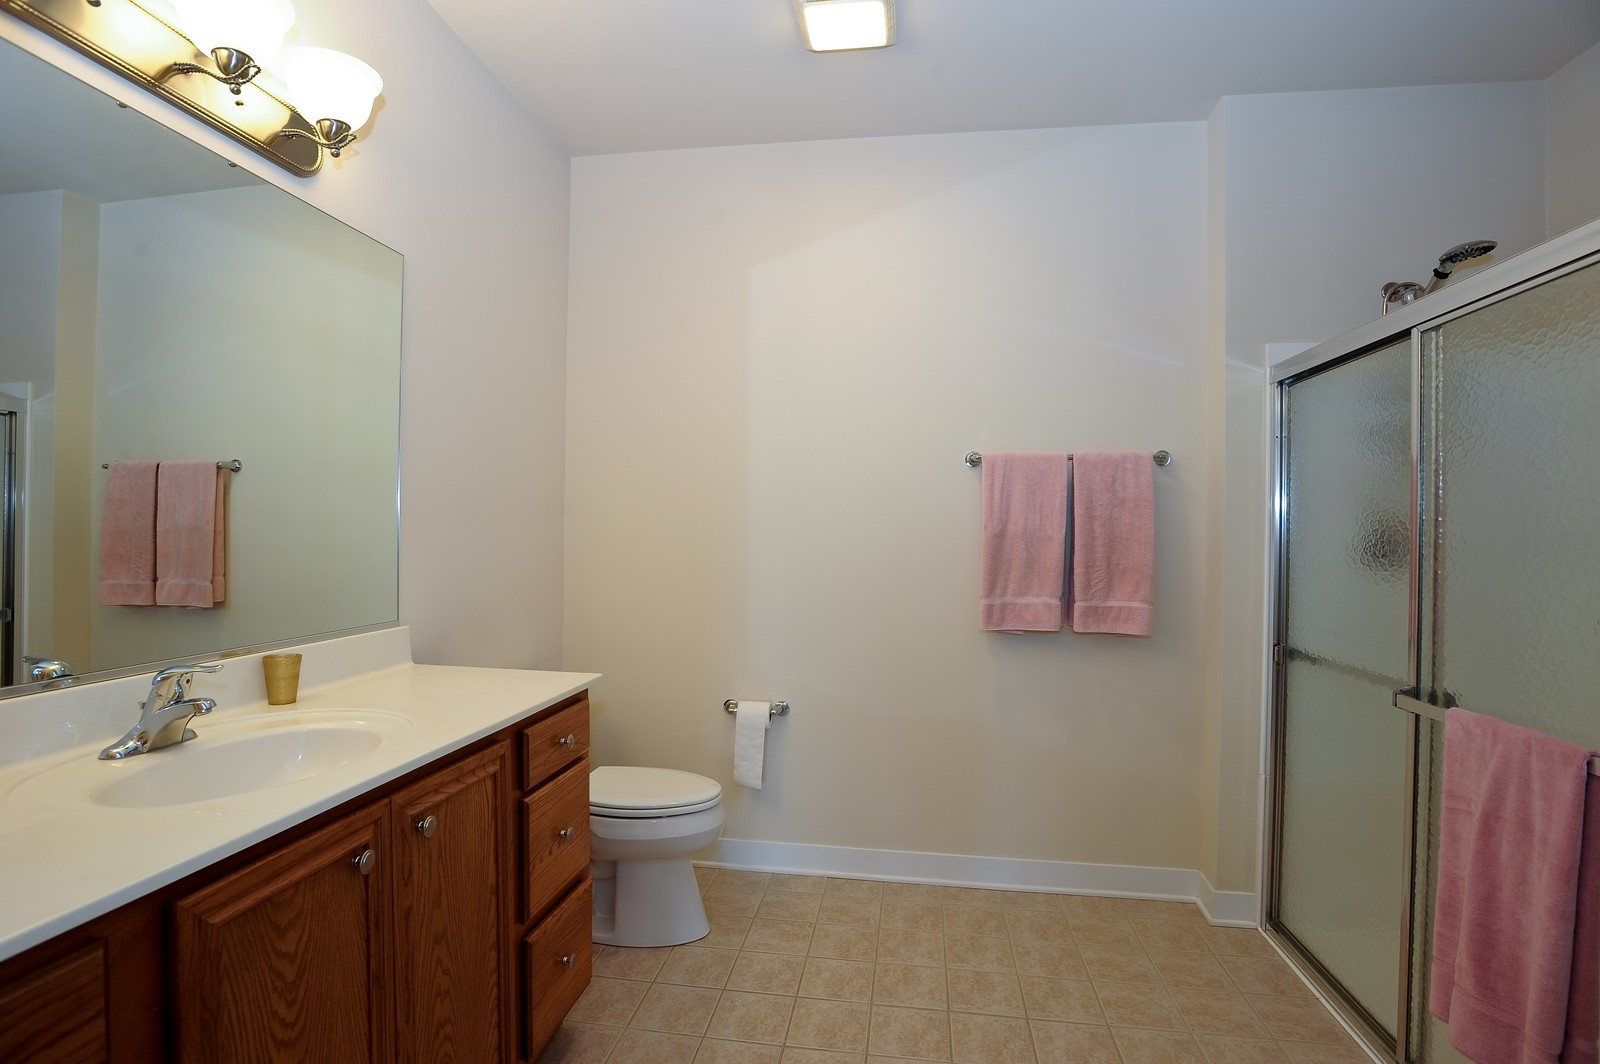 Real Estate Photography - 2692 Stone Circle, 209, Geneva, IL, 60134 - Master Bathroom